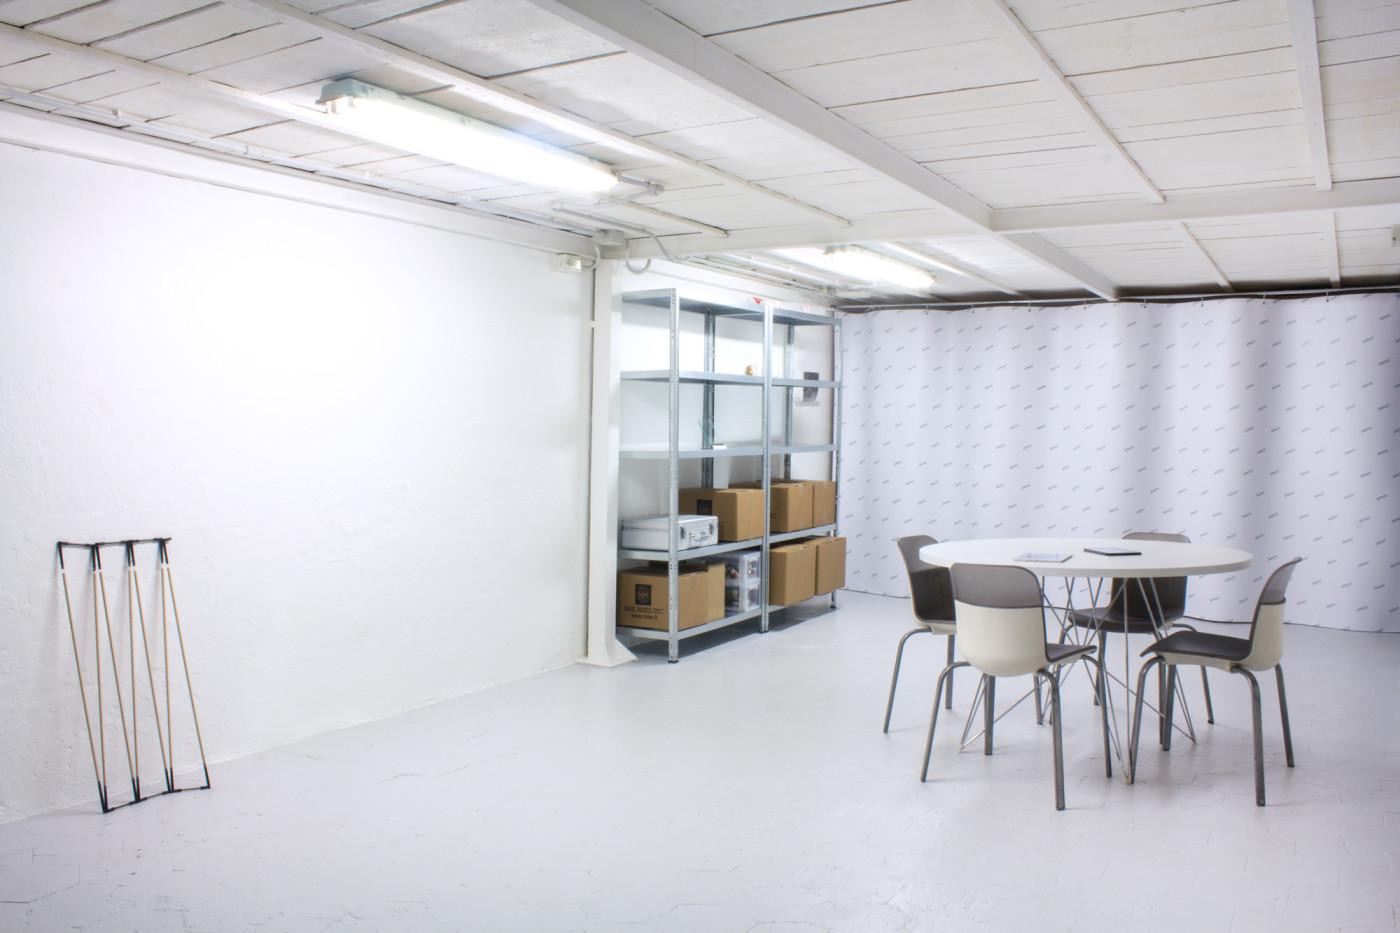 bb5000studio_corazon_installation_view_1